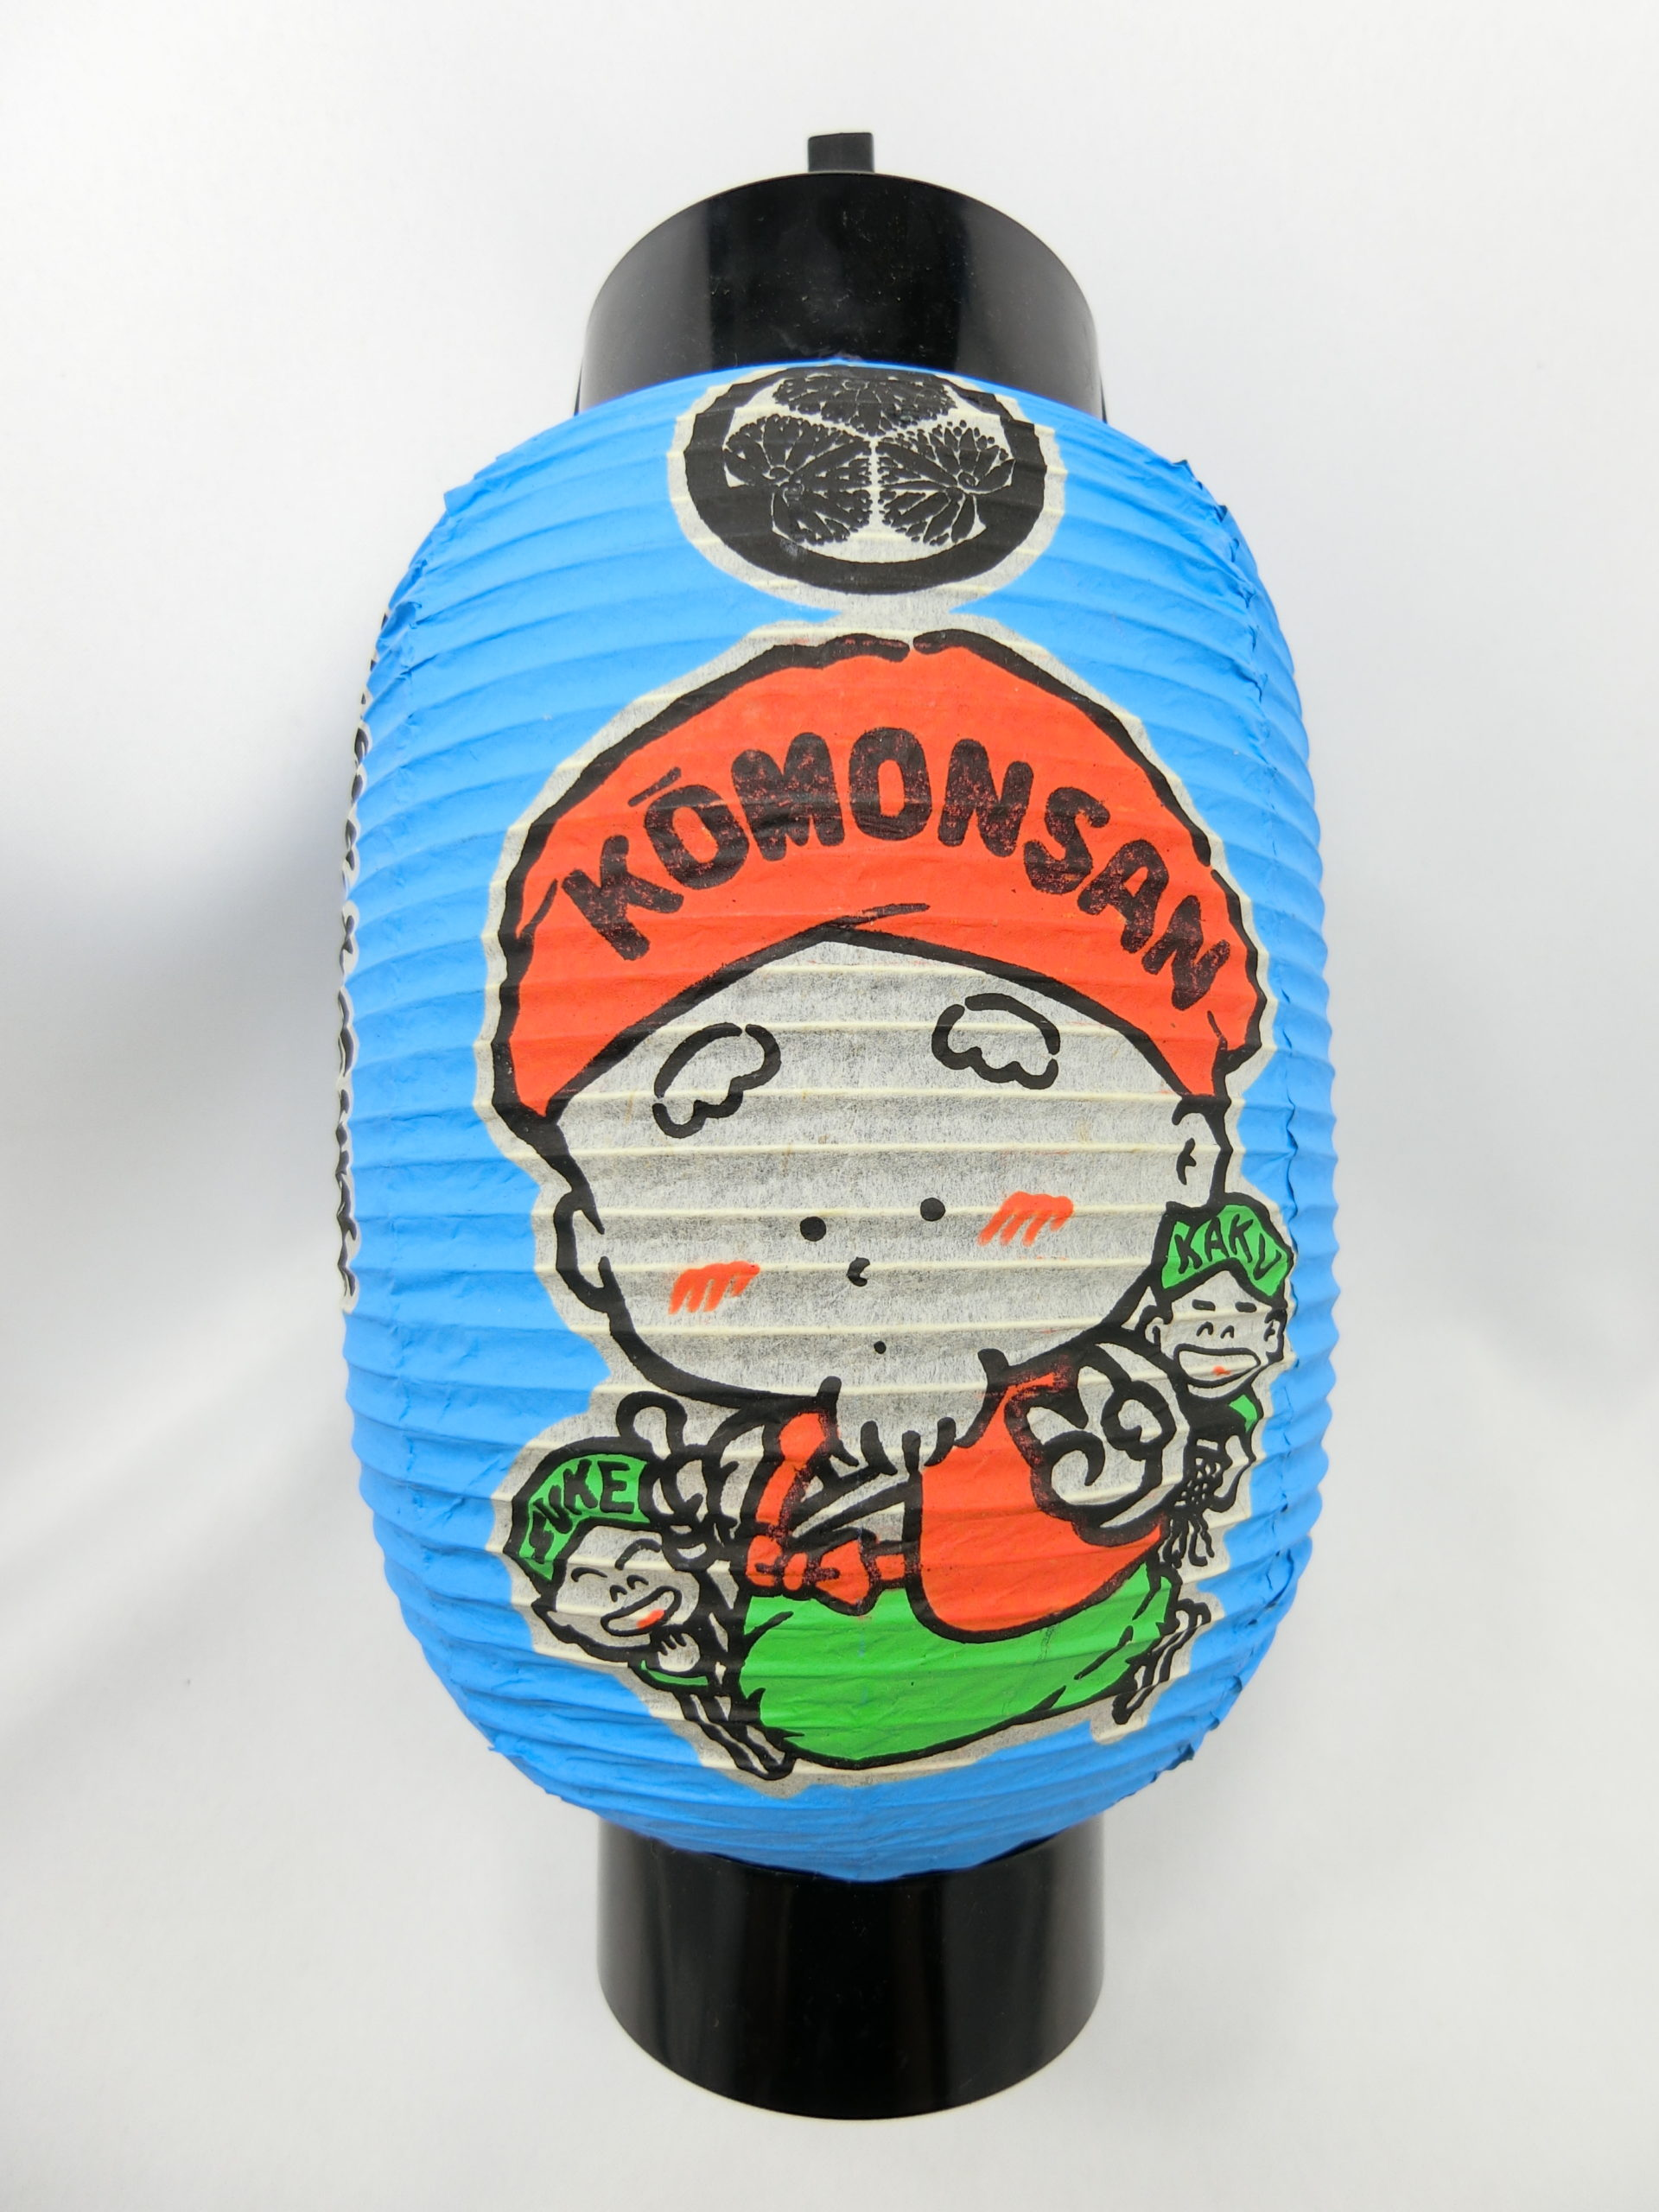 KOMONSAN(東映太秦映画村)